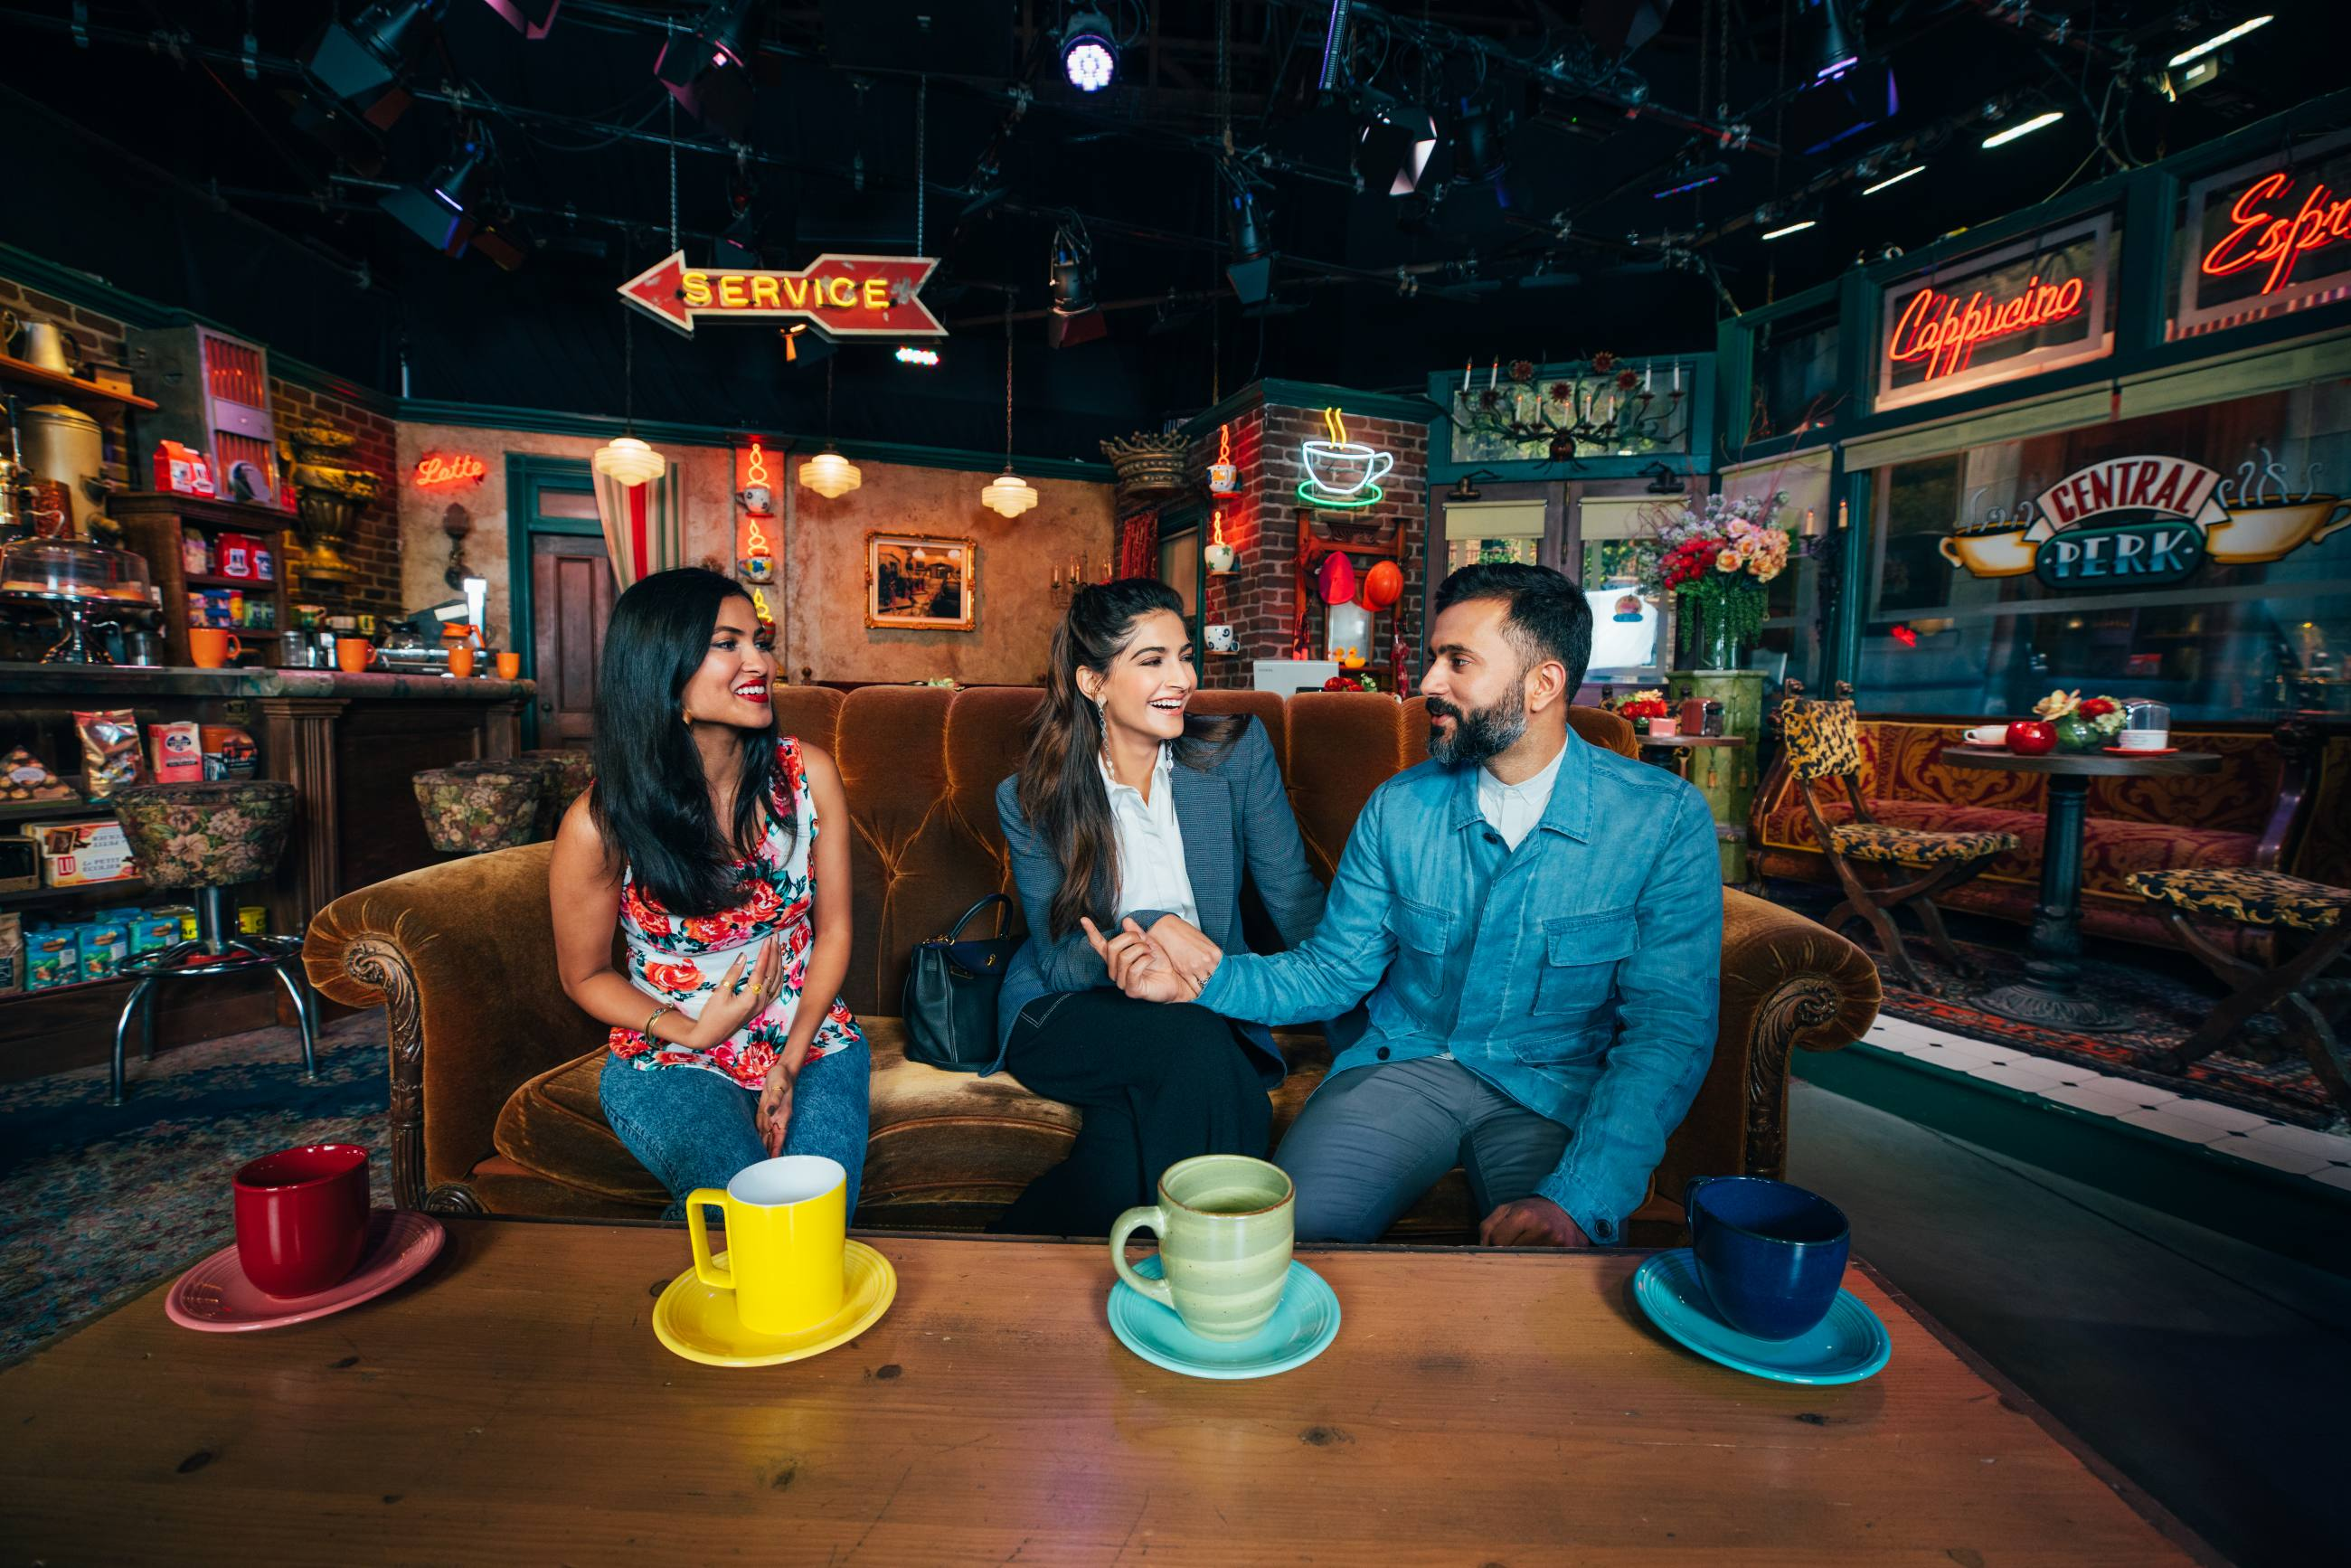 Sonam Kapoor, Anand Ahuja & Vinya Vox at Stage 48